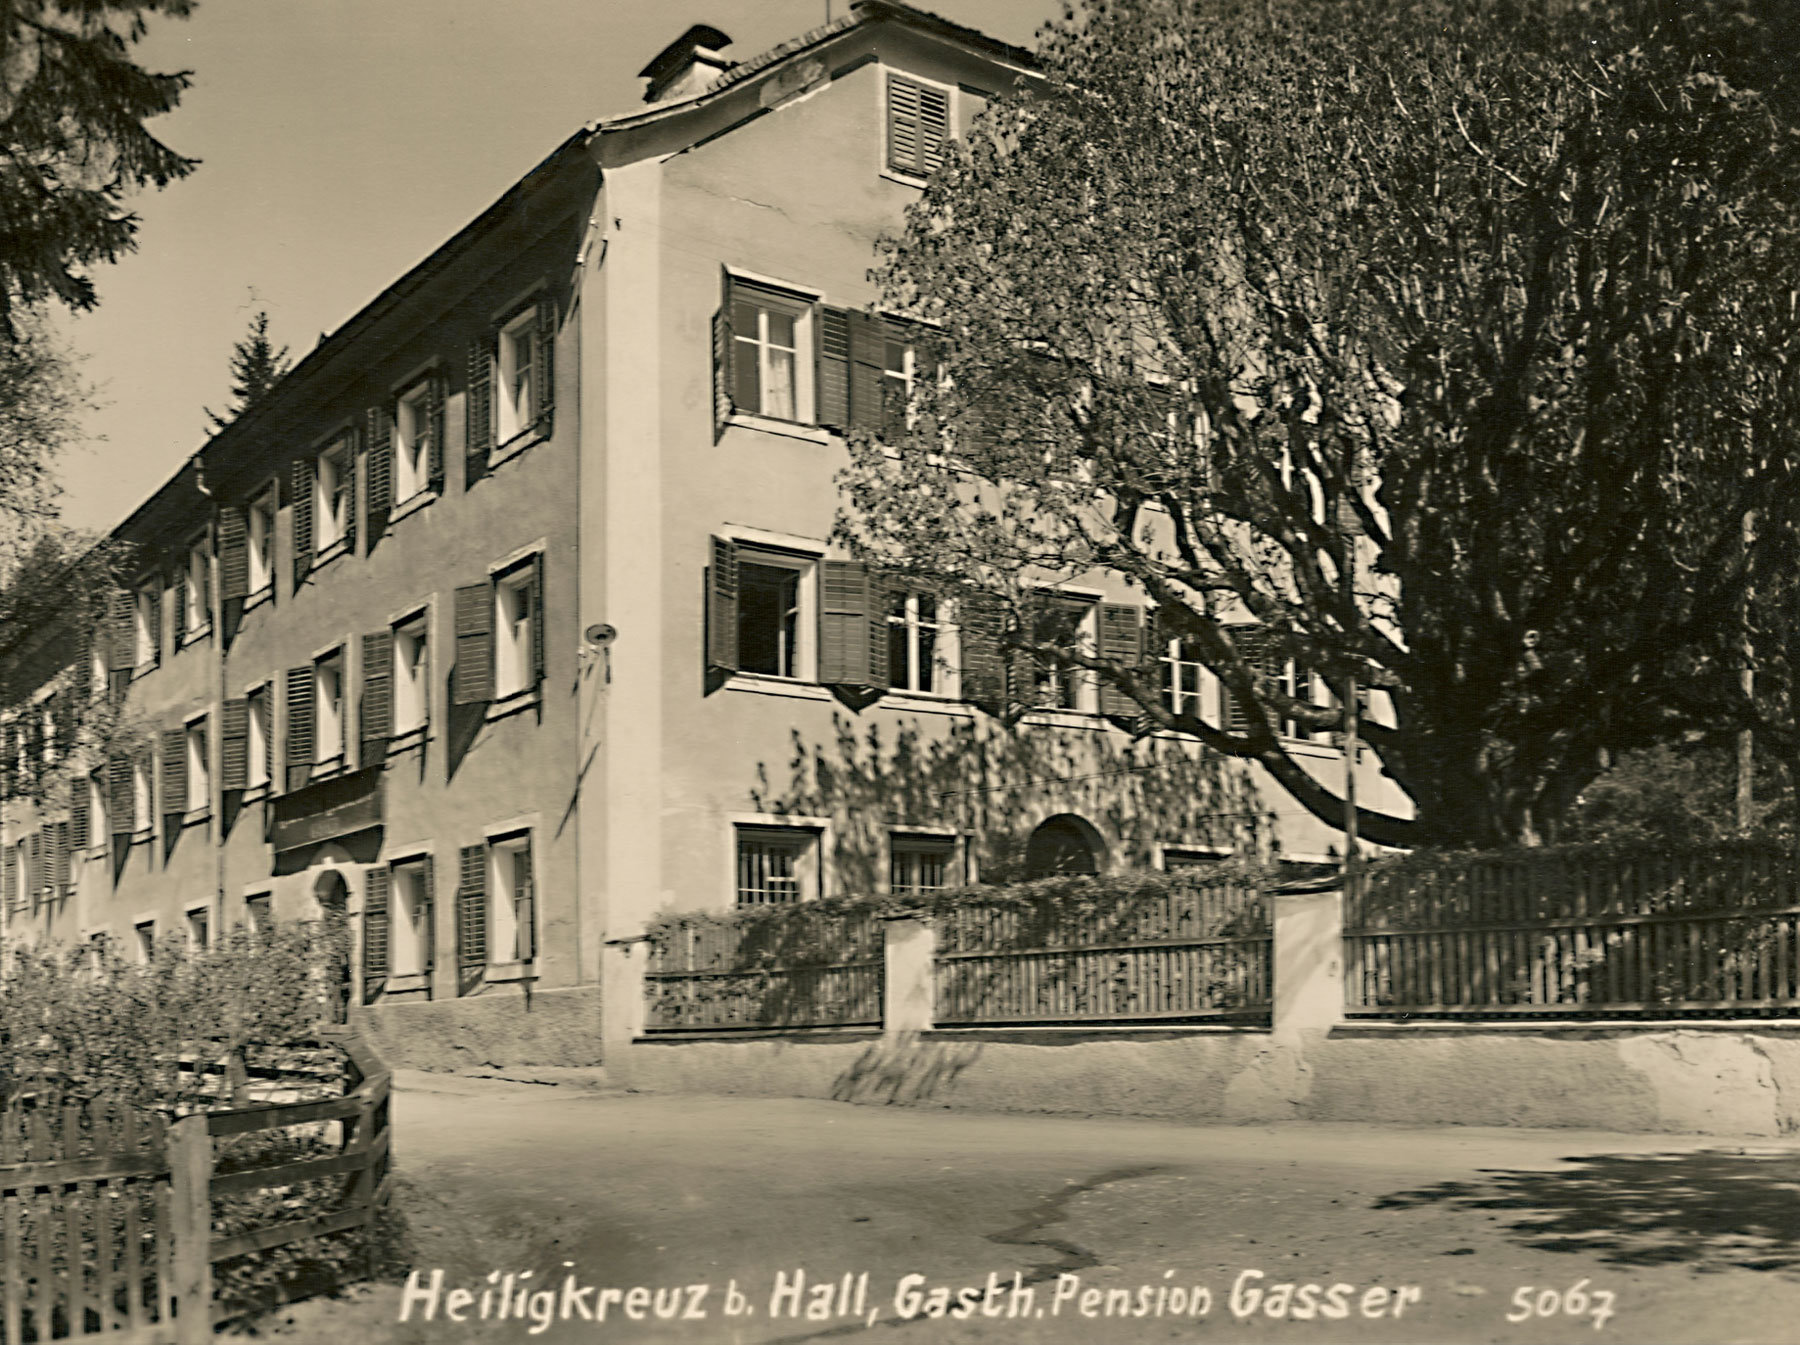 Hotel Heiligkreuz 1930